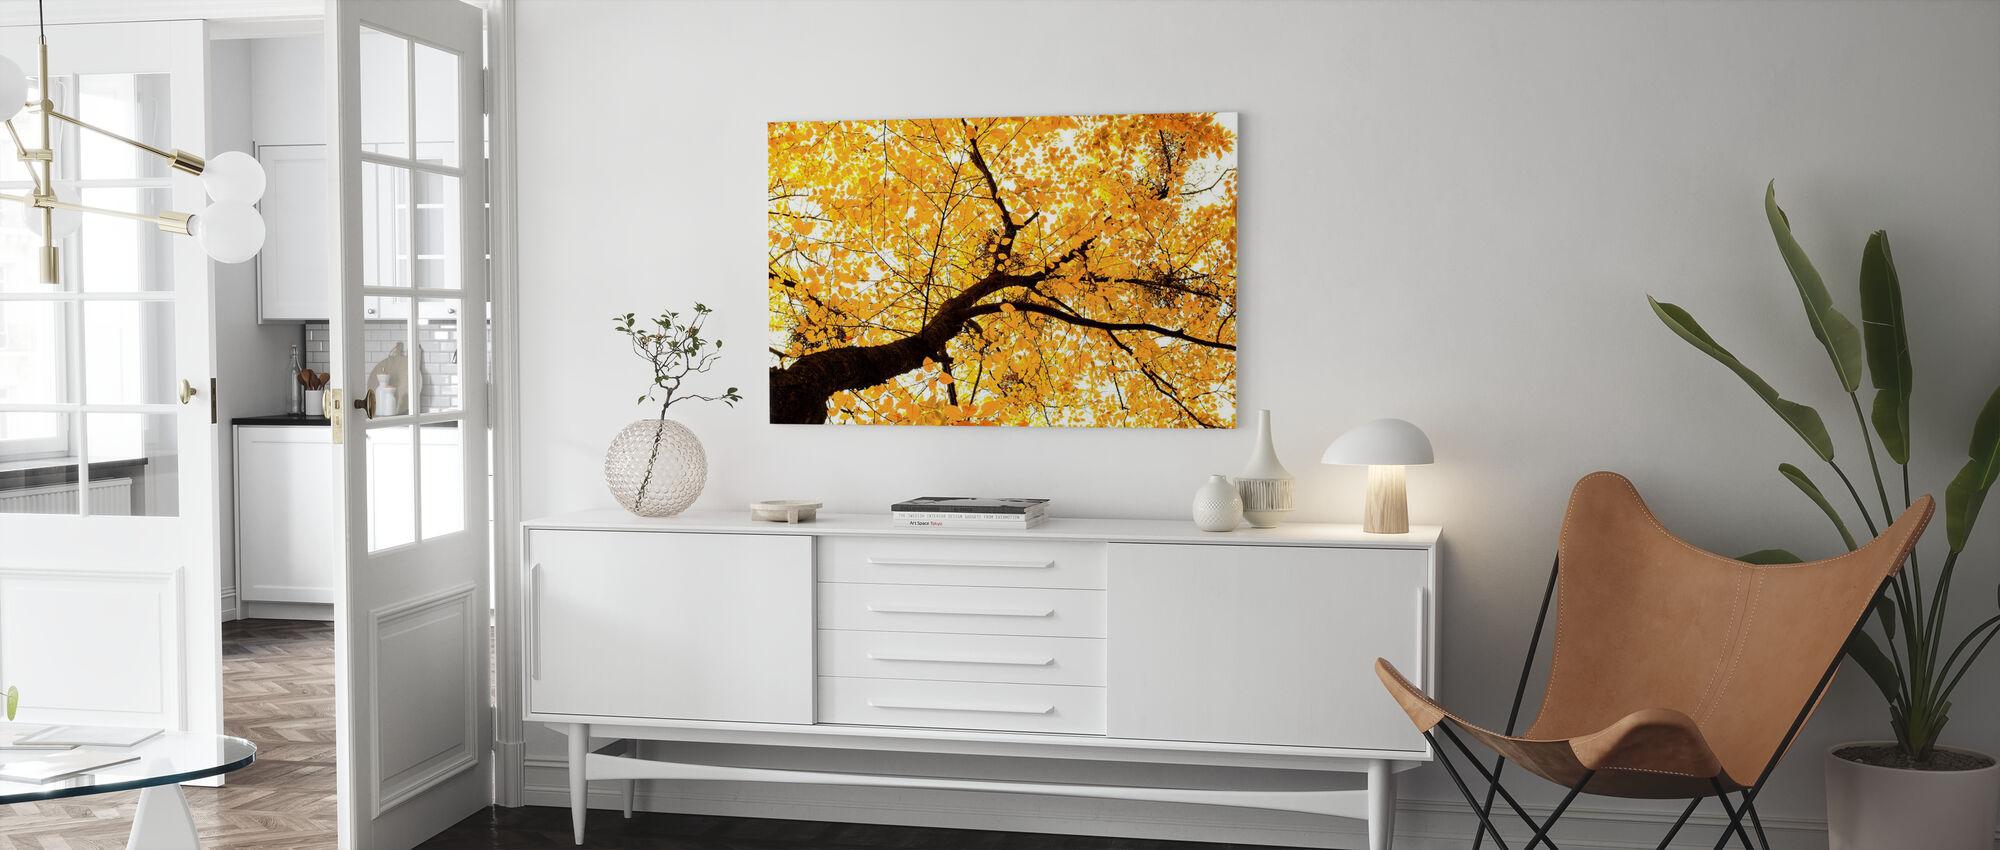 Golden Leaves - Canvas print - Living Room